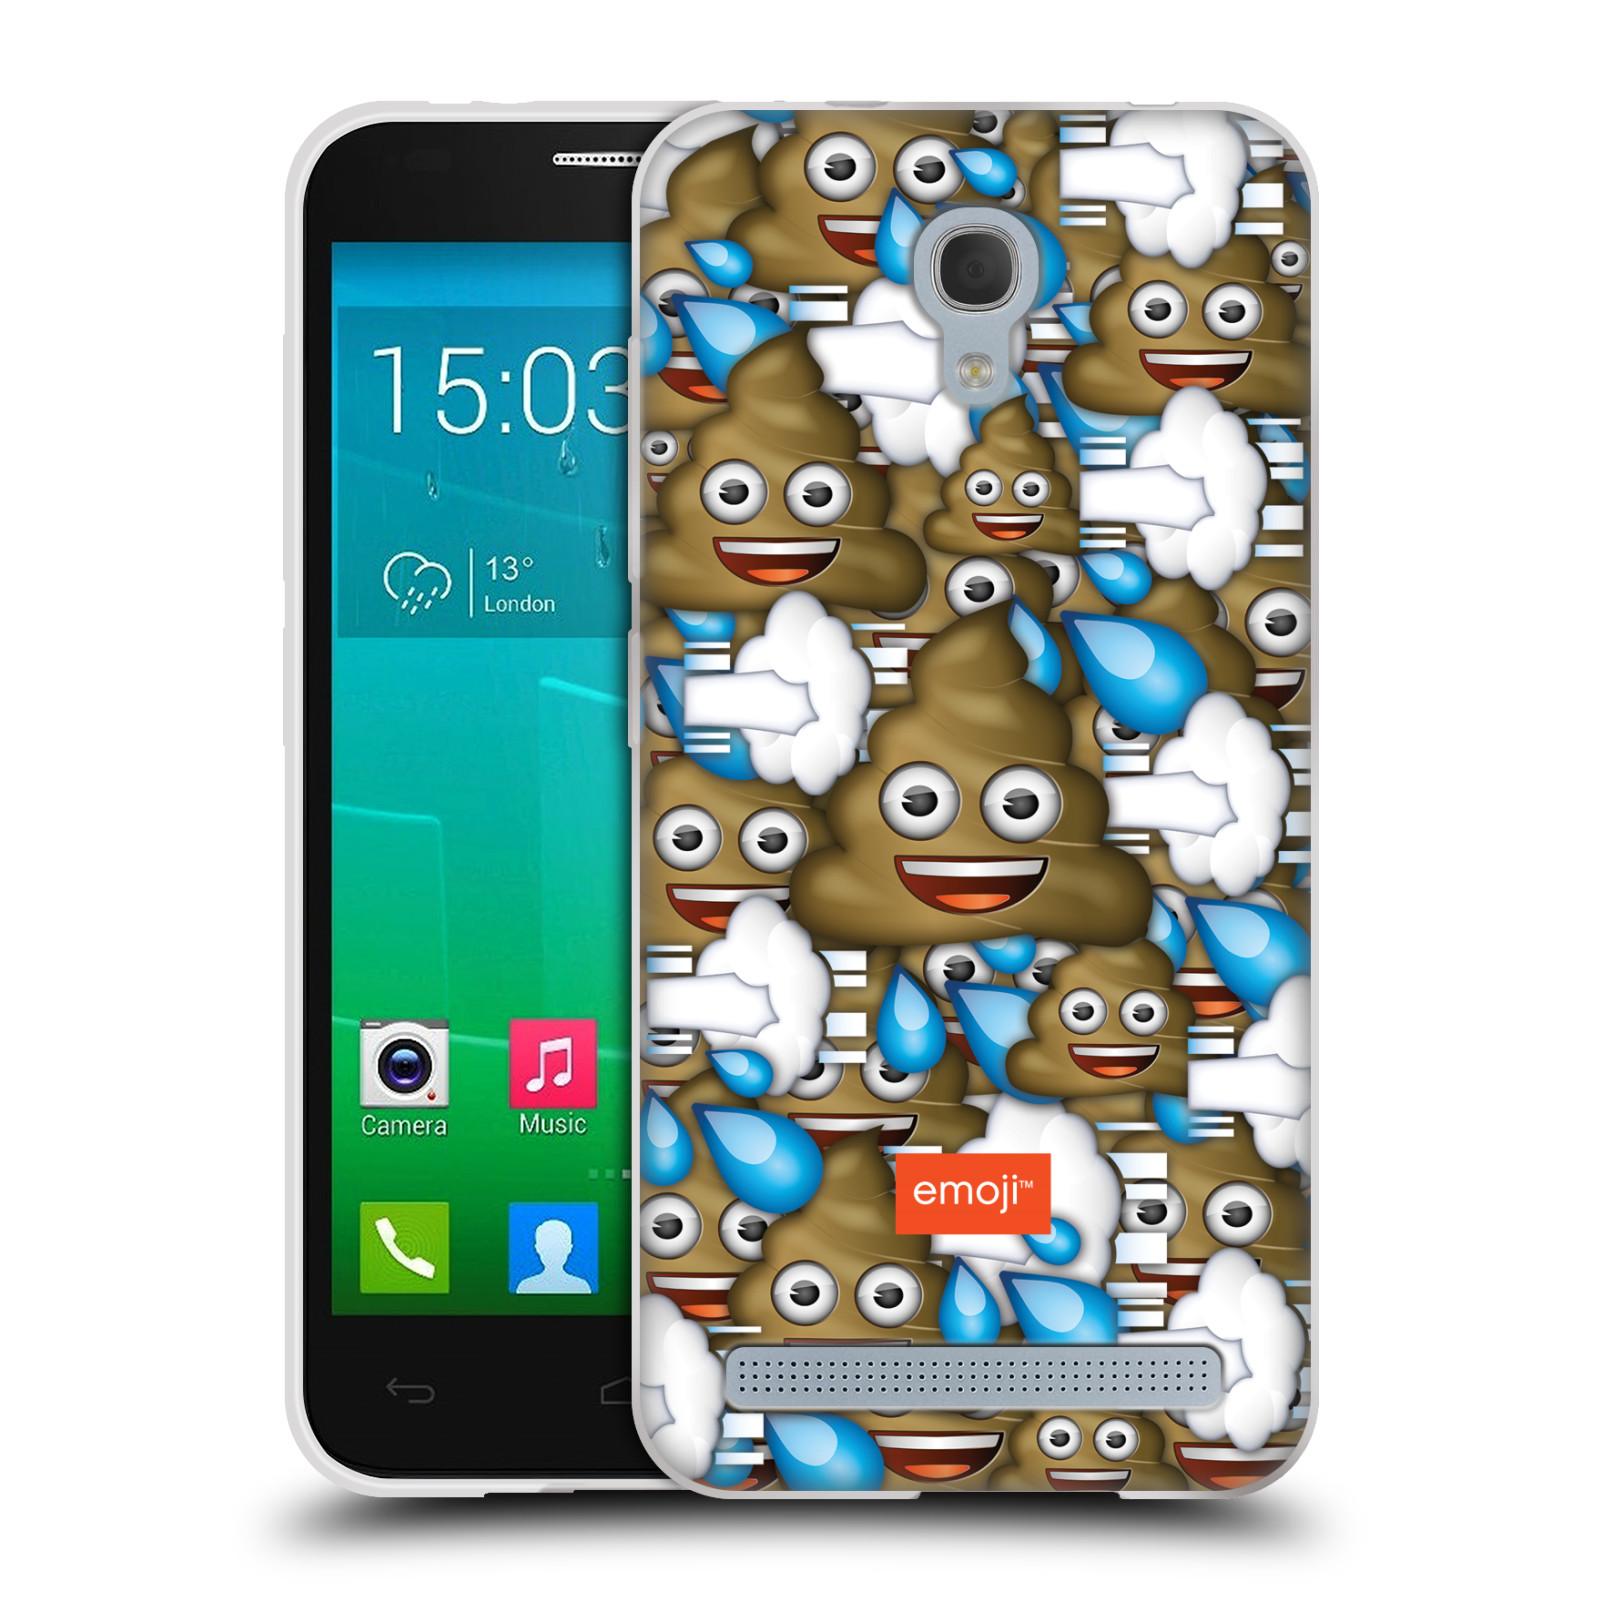 Silikonové pouzdro na mobil Alcatel One Touch Idol 2 Mini S 6036Y HEAD CASE EMOJI - Hovínka a prdíky (Silikonový kryt či obal s oficiálním motivem EMOJI na mobilní telefon Alcatel Idol 2 Mini S OT-6036Y)